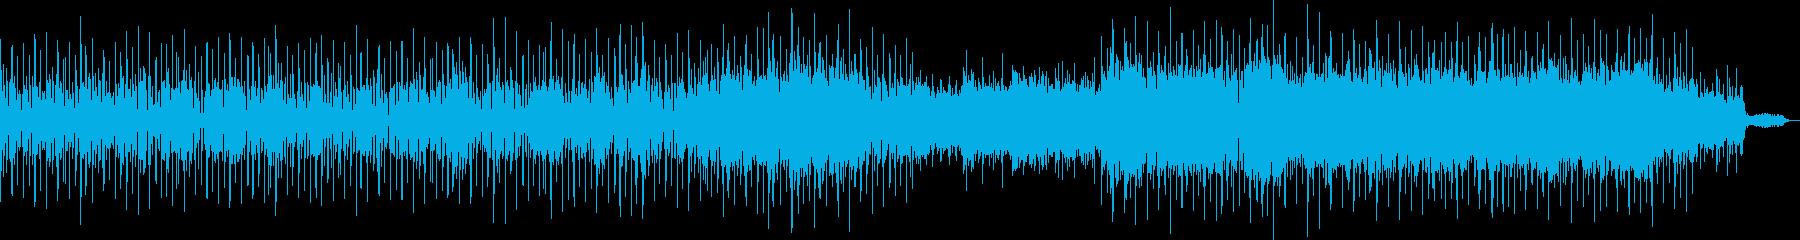 Rhythmical and peaceful BGM's reproduced waveform